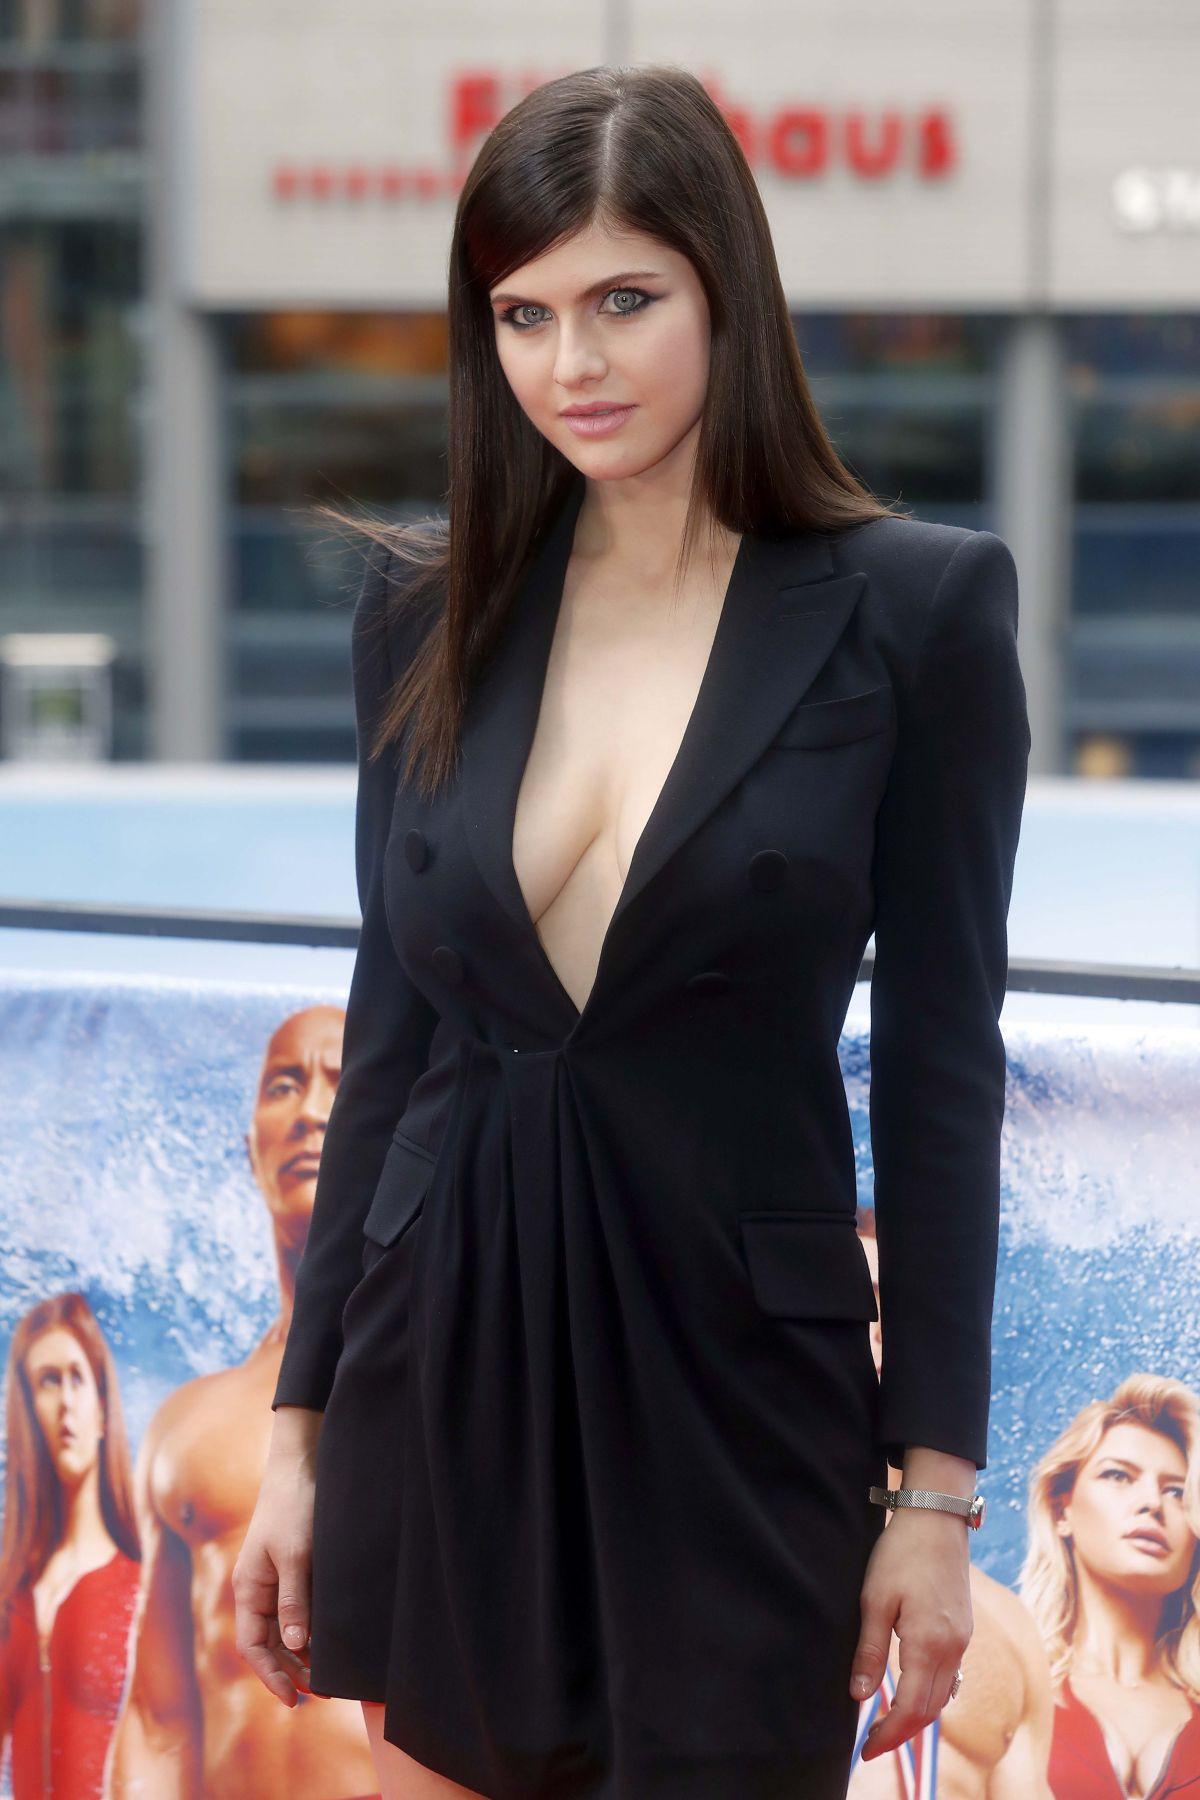 Hannah murray elinor crawley nude bridgend 2015 hd naked (21 photos), Bikini Celebrity images